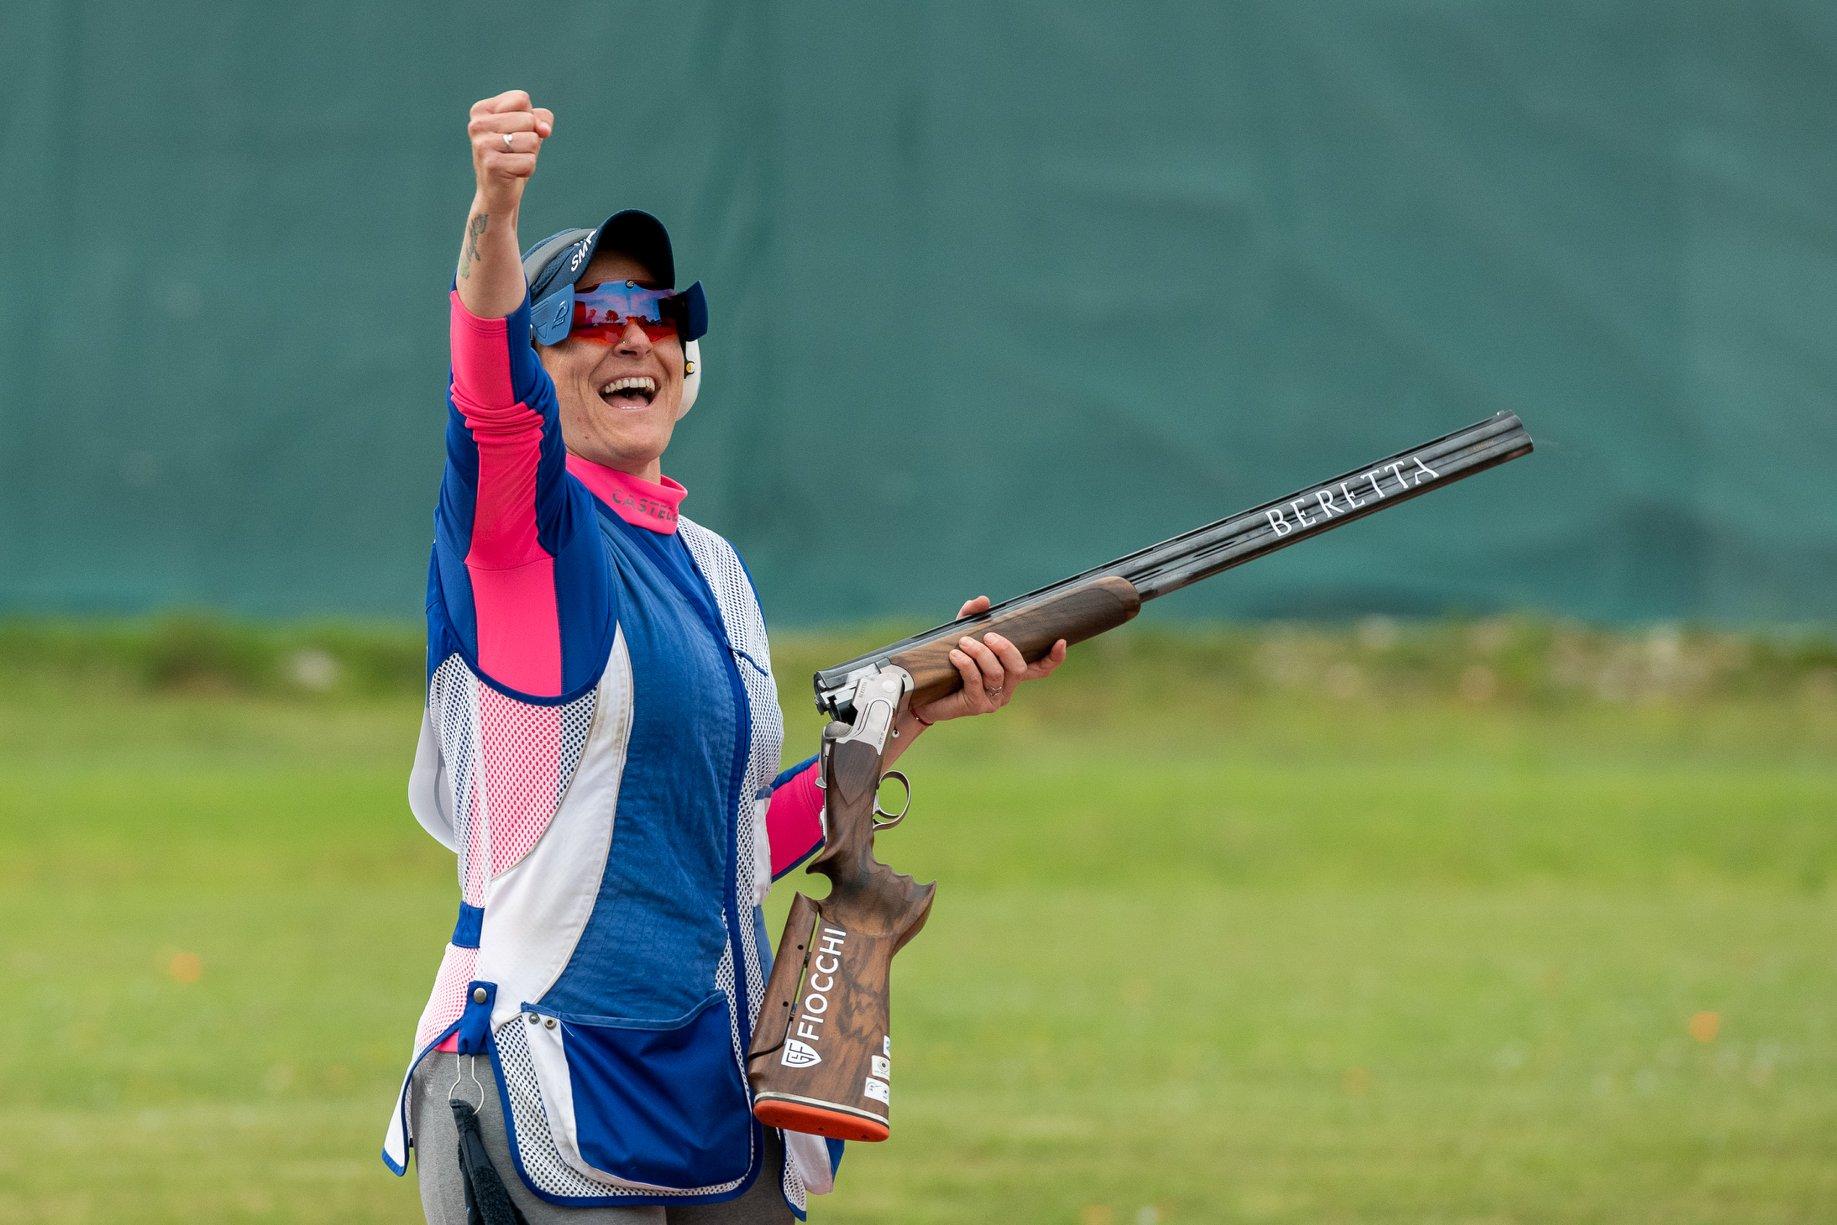 SHOTGUN: FIOCCHI WON 8 MEDALS AT THE ISSF WORLD CUP IN LONATO DEL GARDA